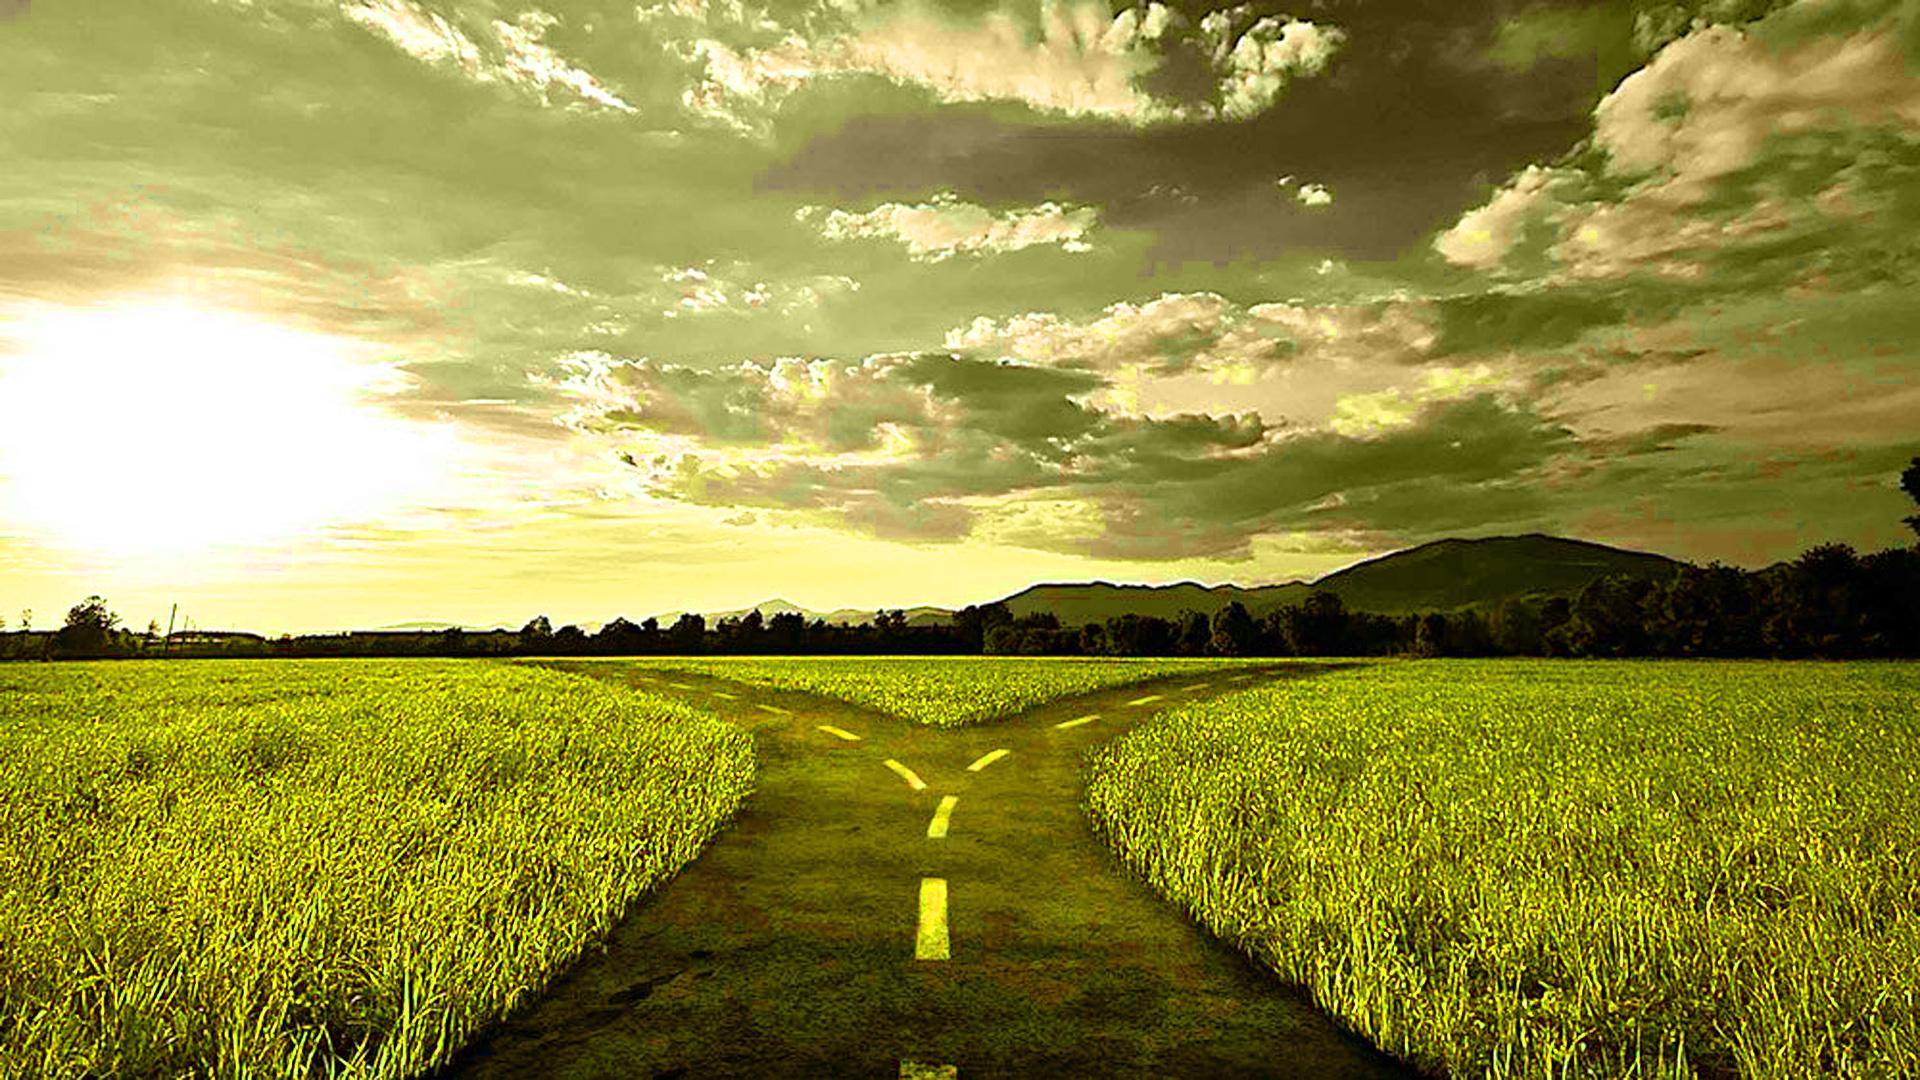 fork_in_the_road2.jpg